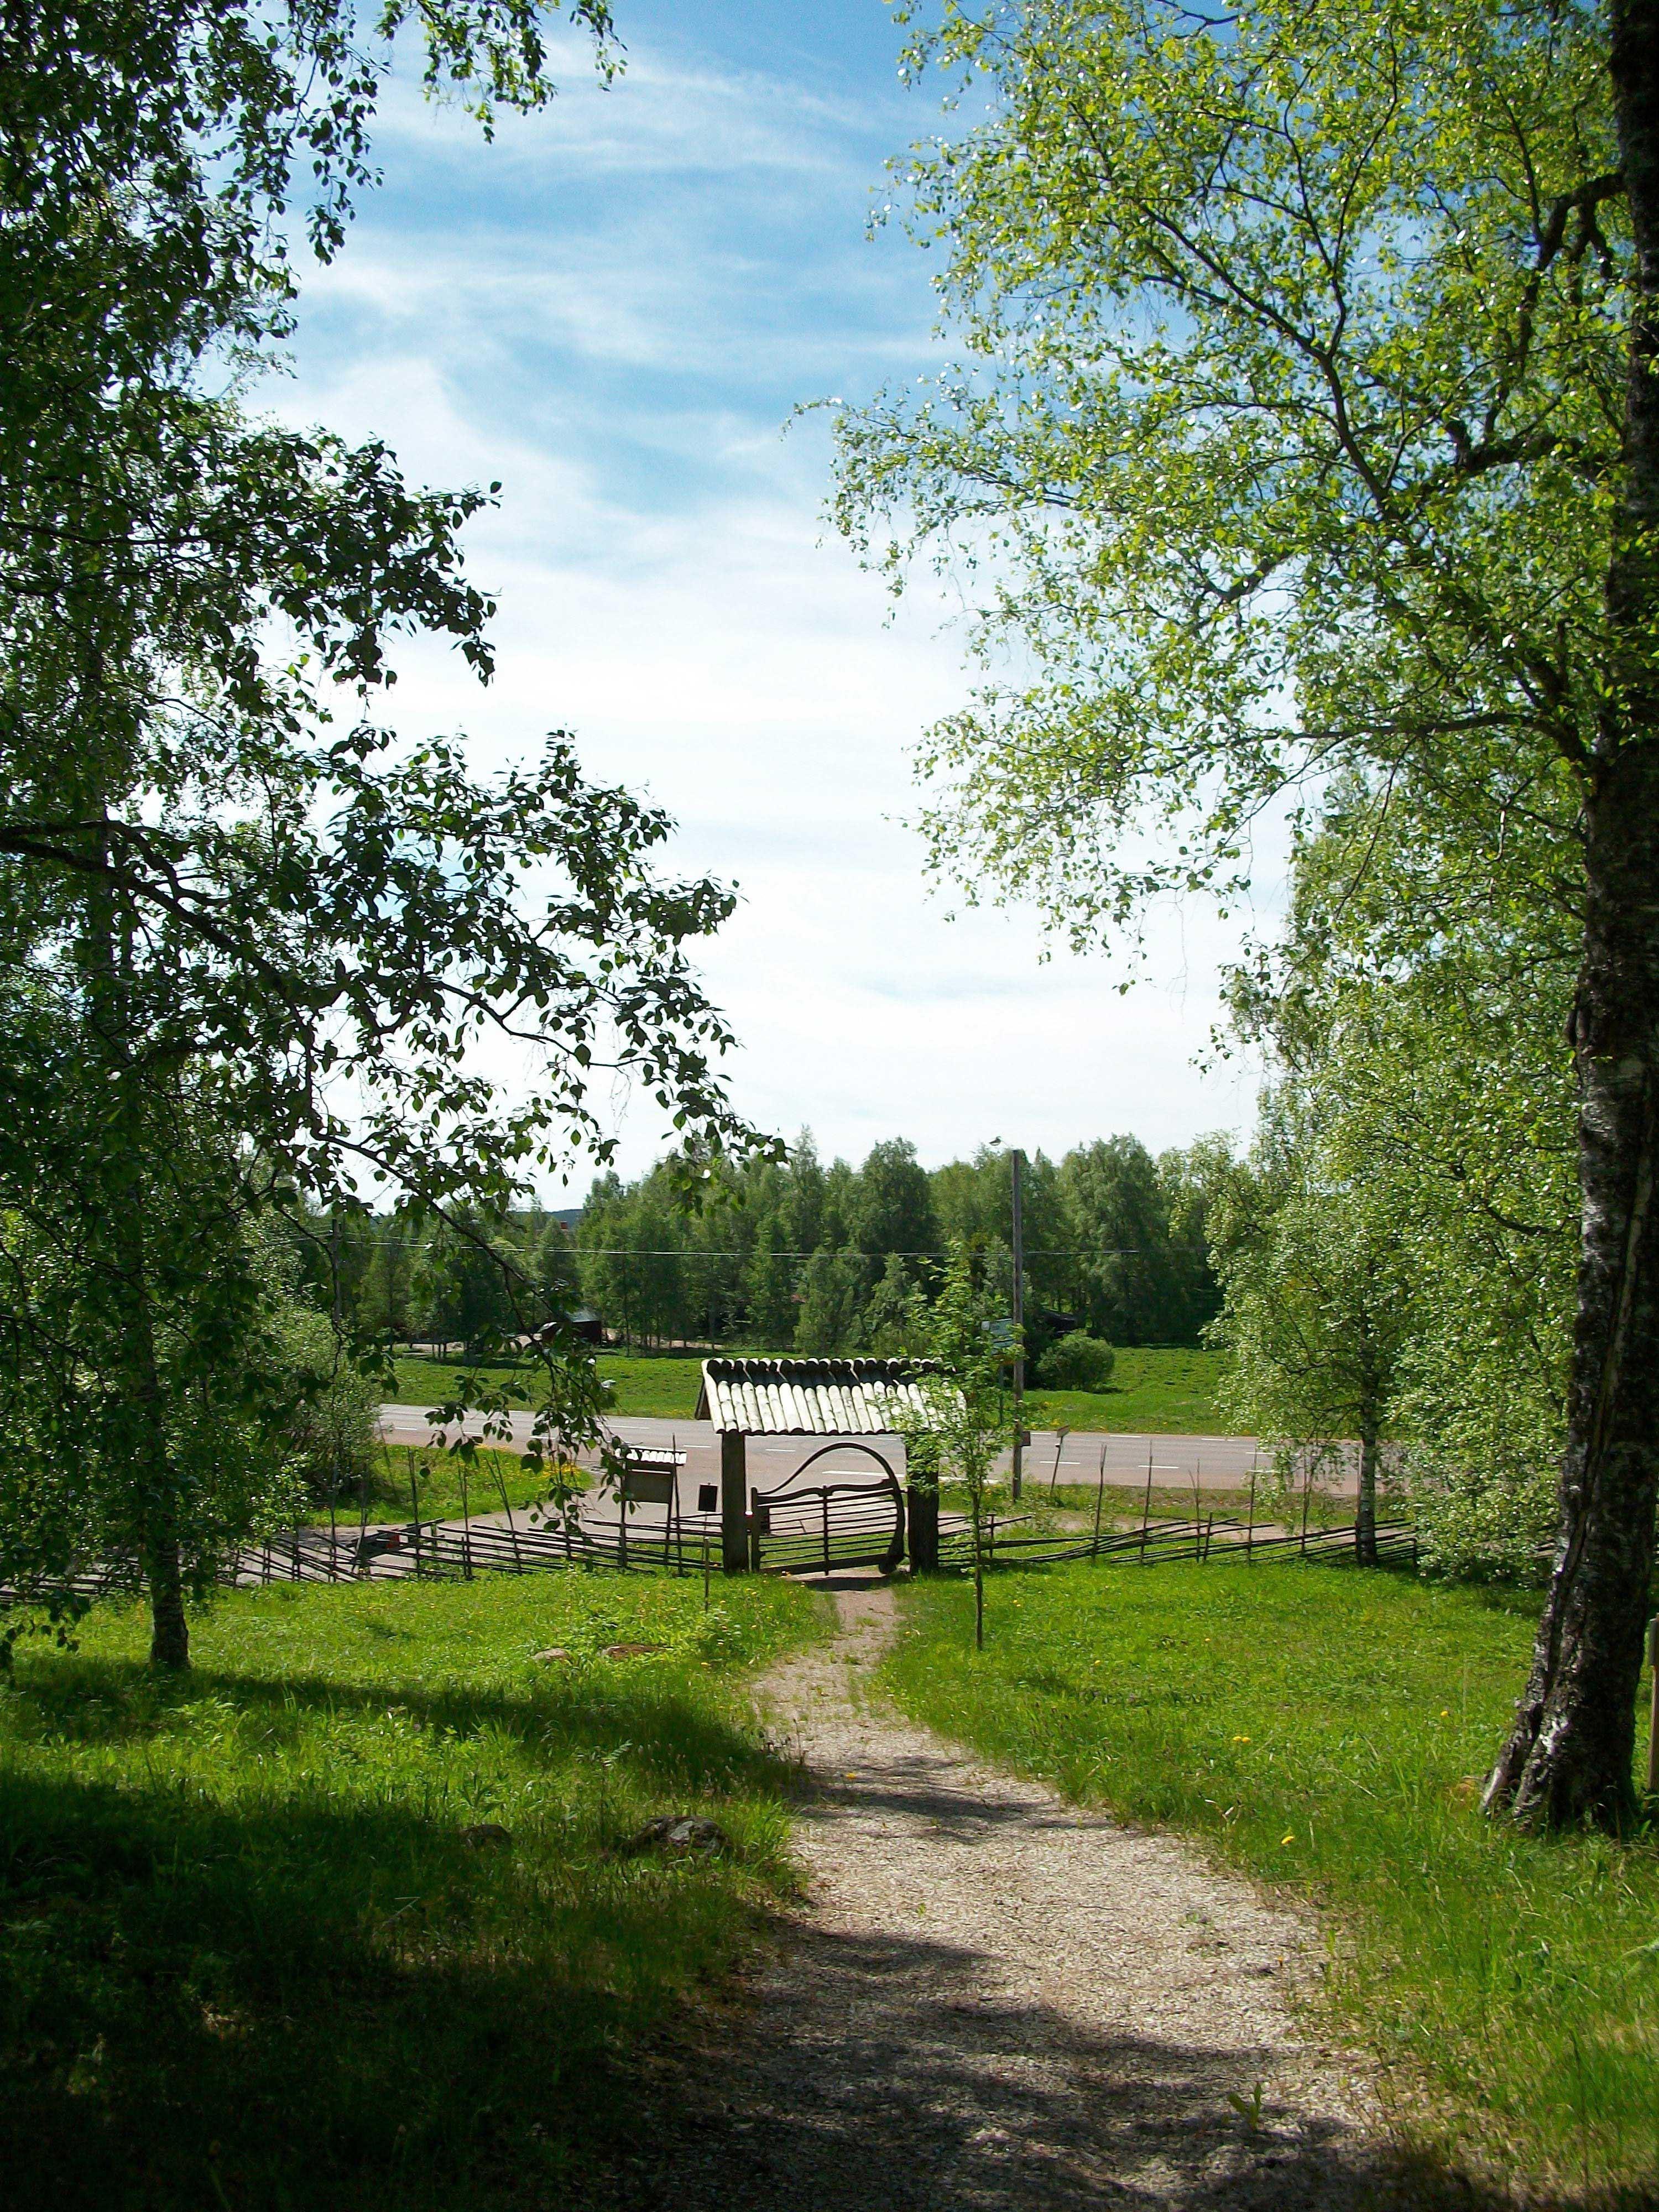 Boda Gammelgård